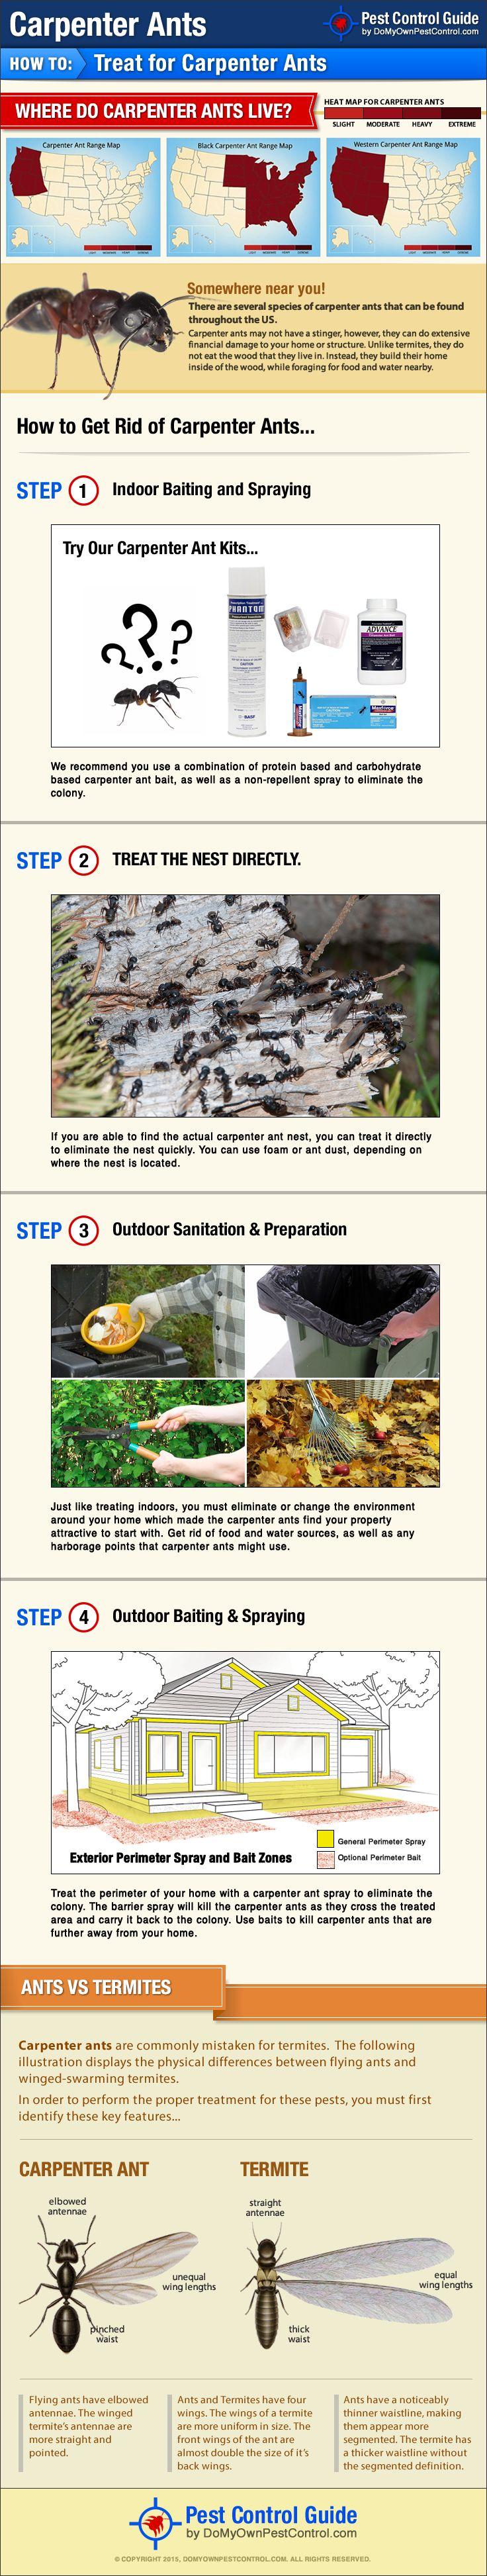 how to kill carpenter bees naturally